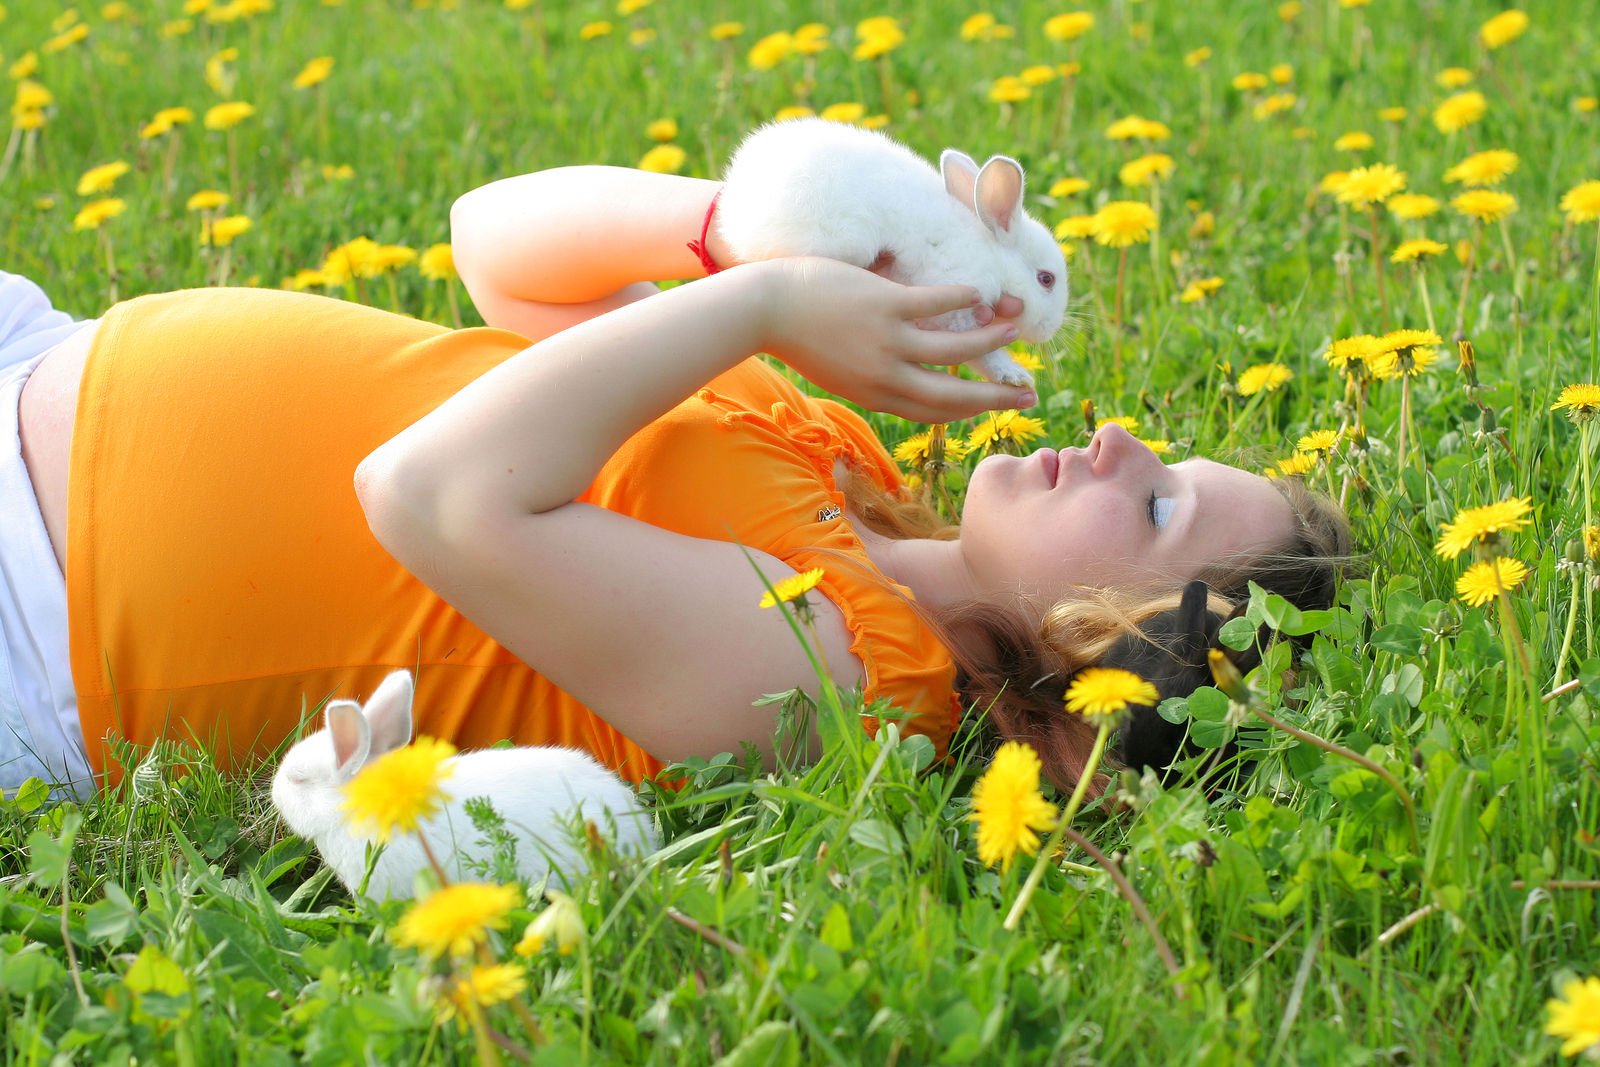 Woman Using The Rabbit 62